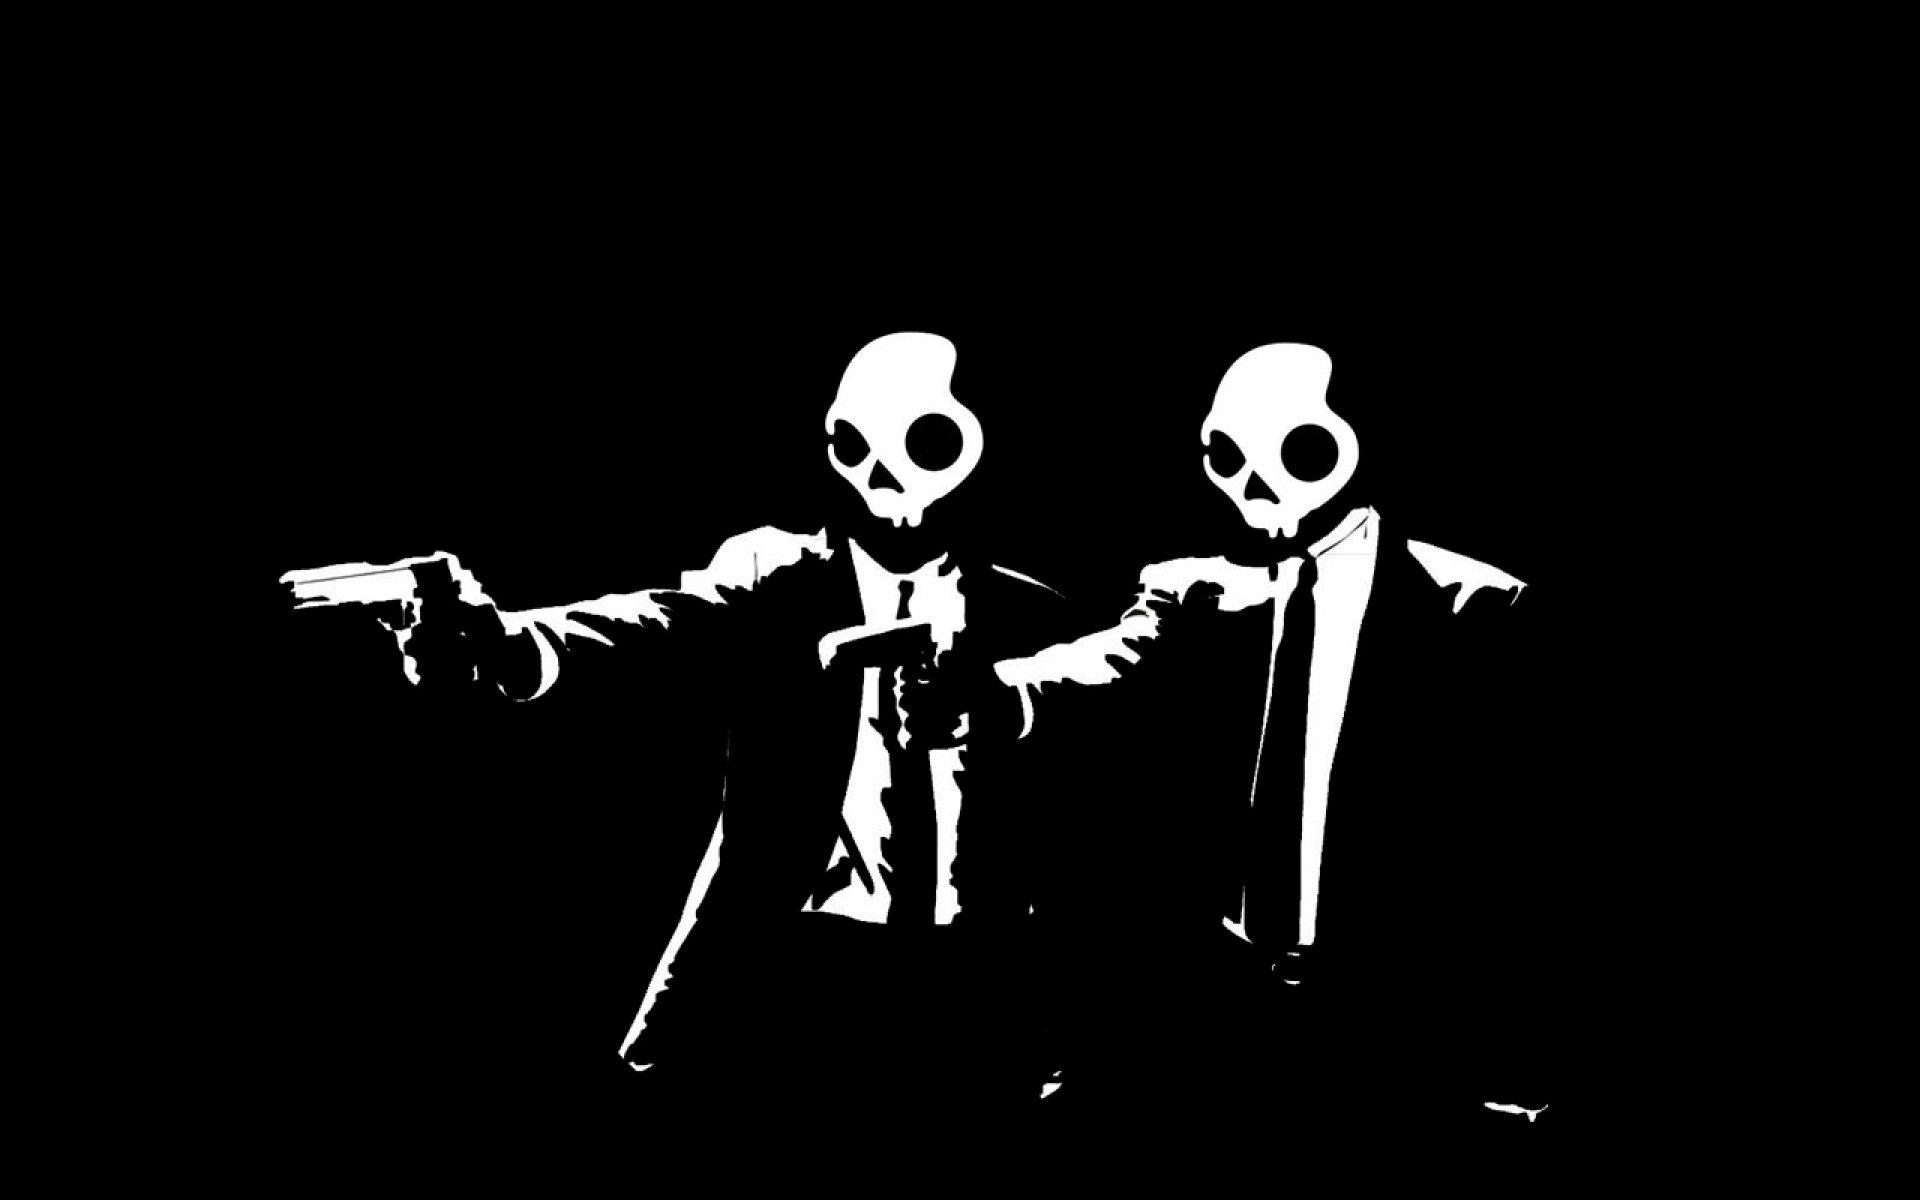 Cool Wallpaper Music Skull - cf9a15f64e5b453db42860b3f8482ea0  Perfect Image Reference_91451.jpg